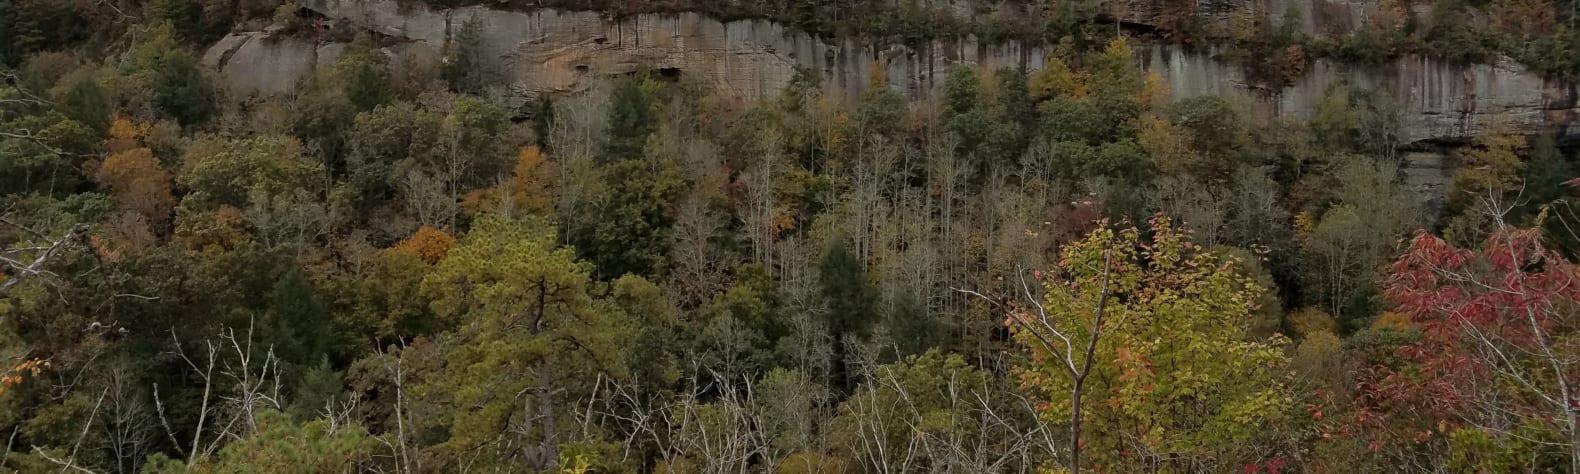 The Lookout on Raven Ridge